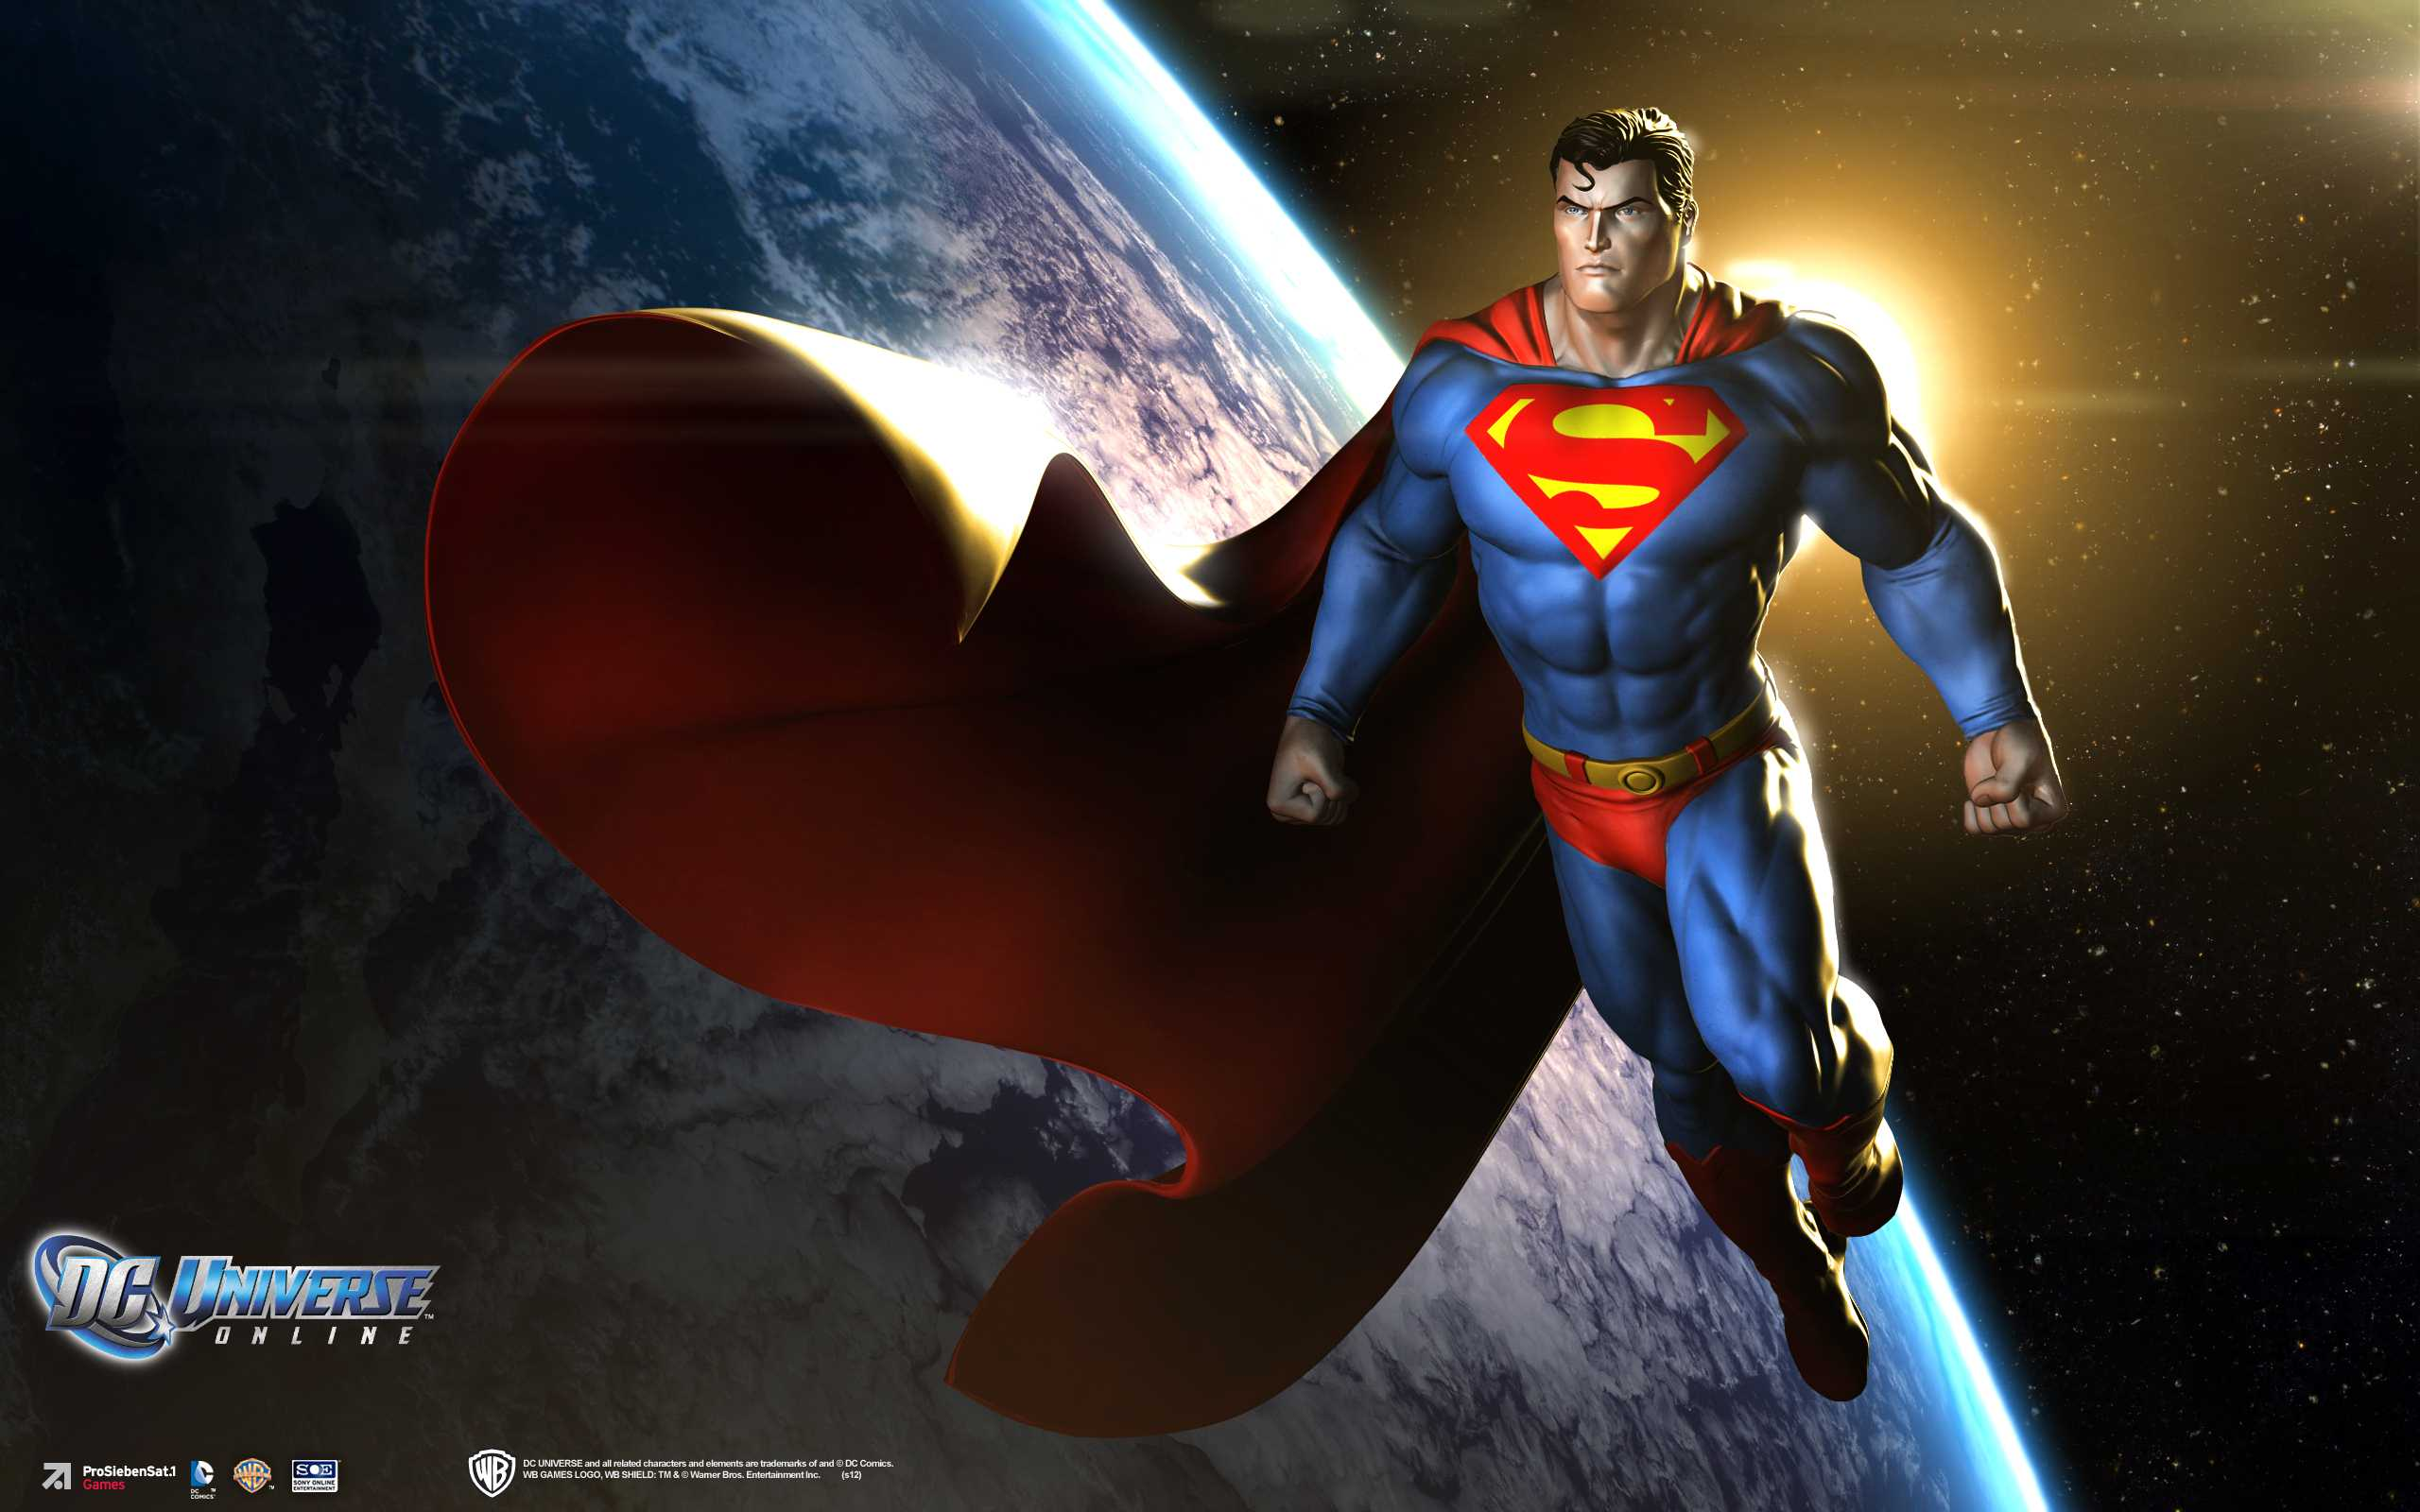 Superman Wallpaper HD Best Collection For Desktop Mobile 2560x1600